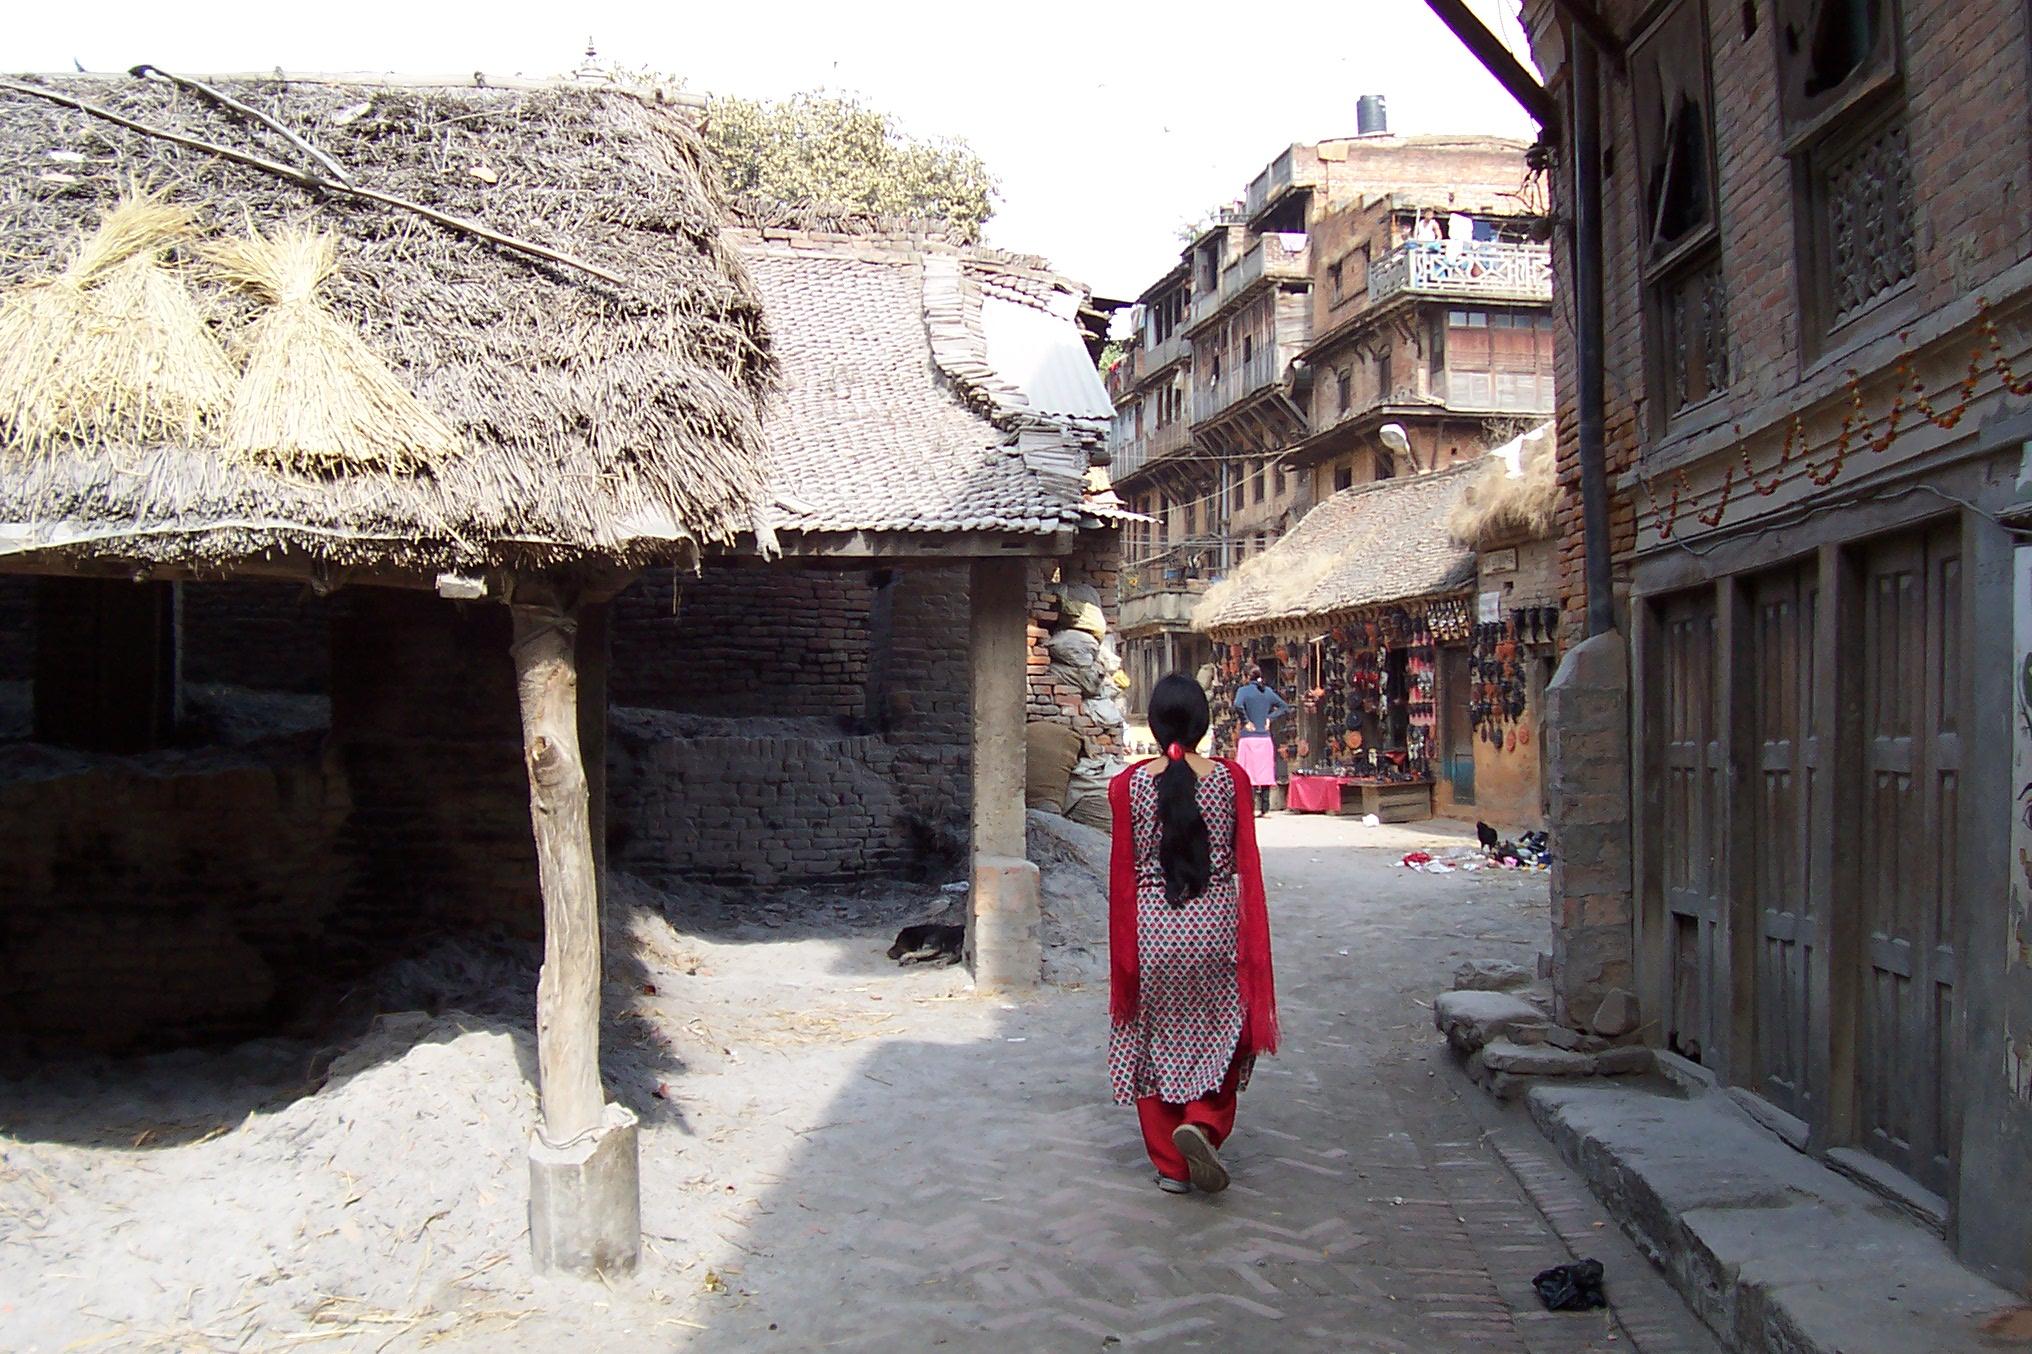 woman walking in street annet asian country shop street sunny